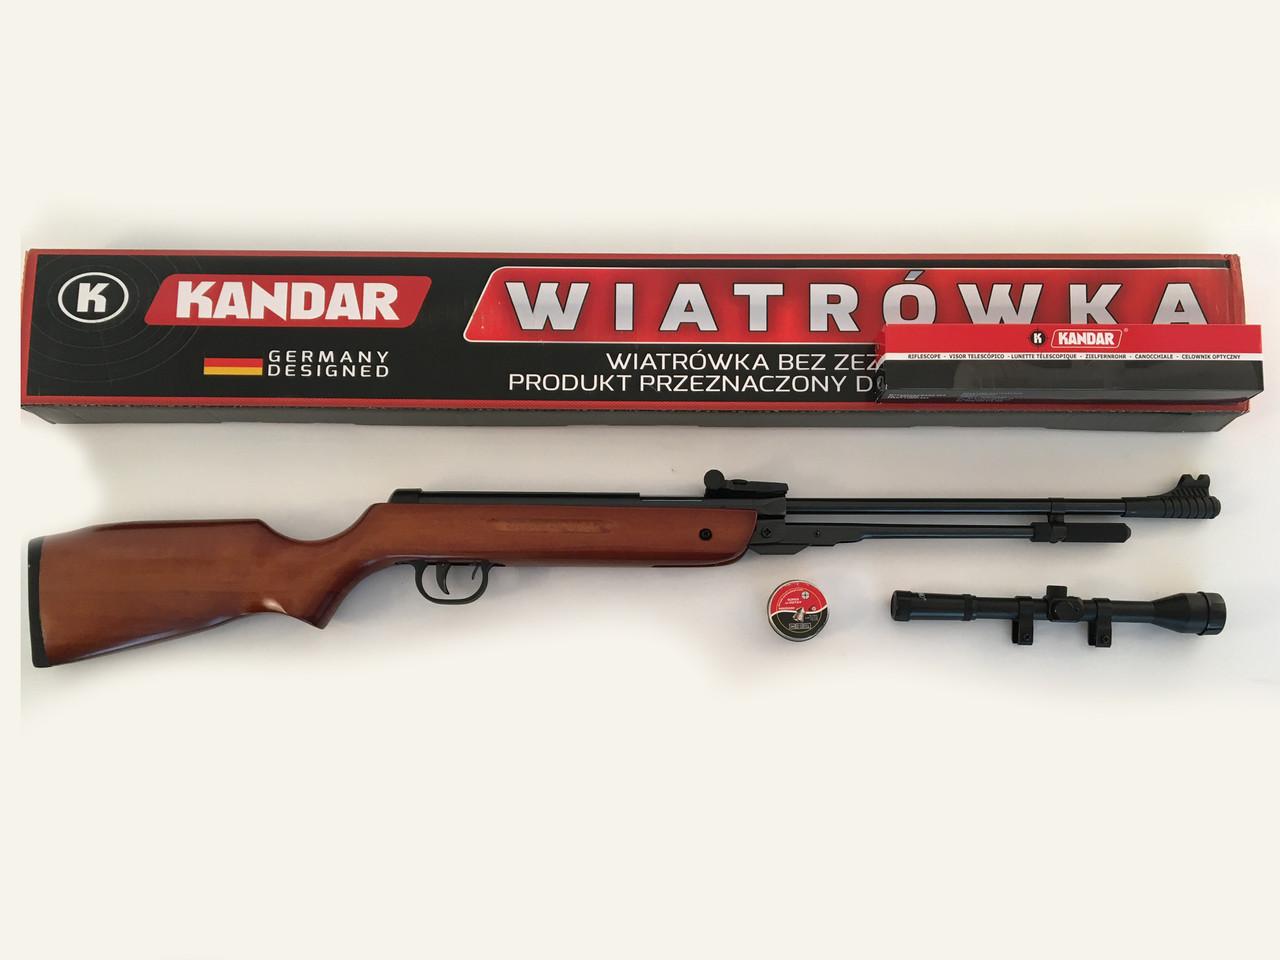 Пневматическая винтовка KANDAR B3-3 оптика 3-7x28TV